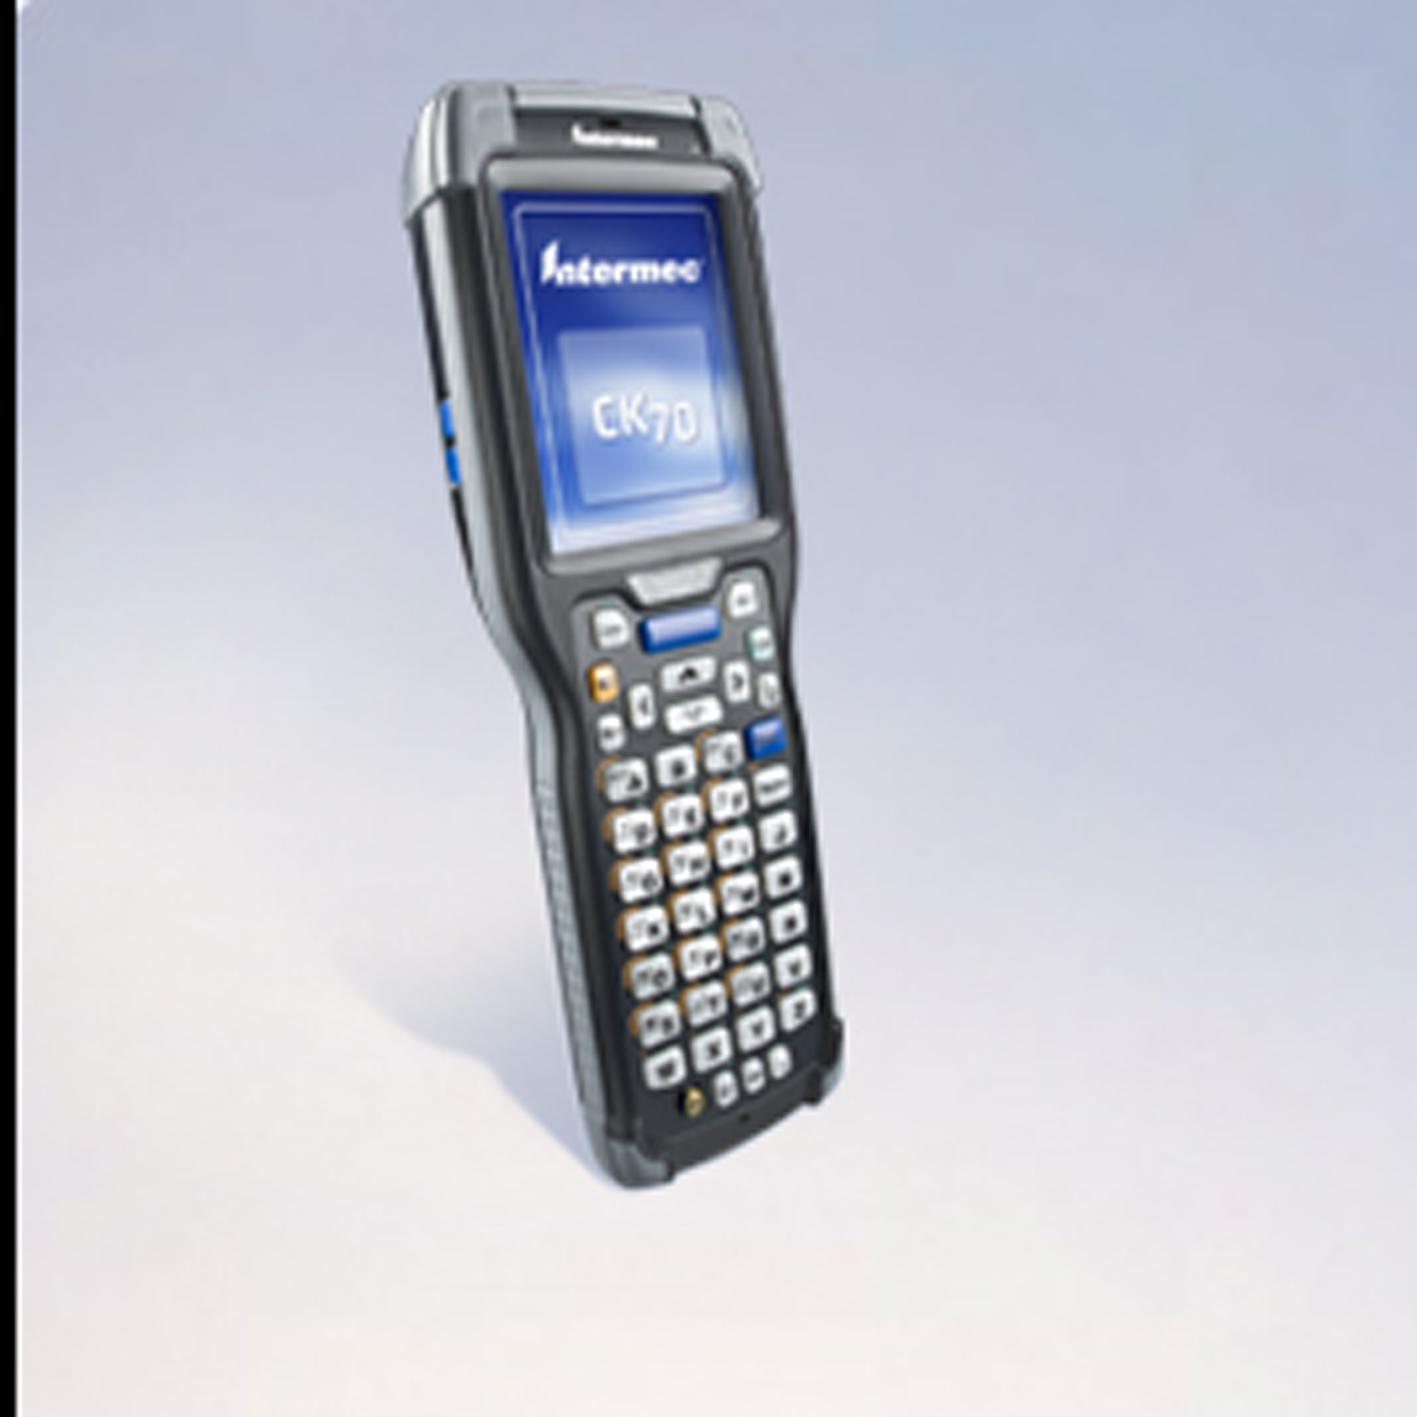 Terminal portable Honeywell Intermec CK70